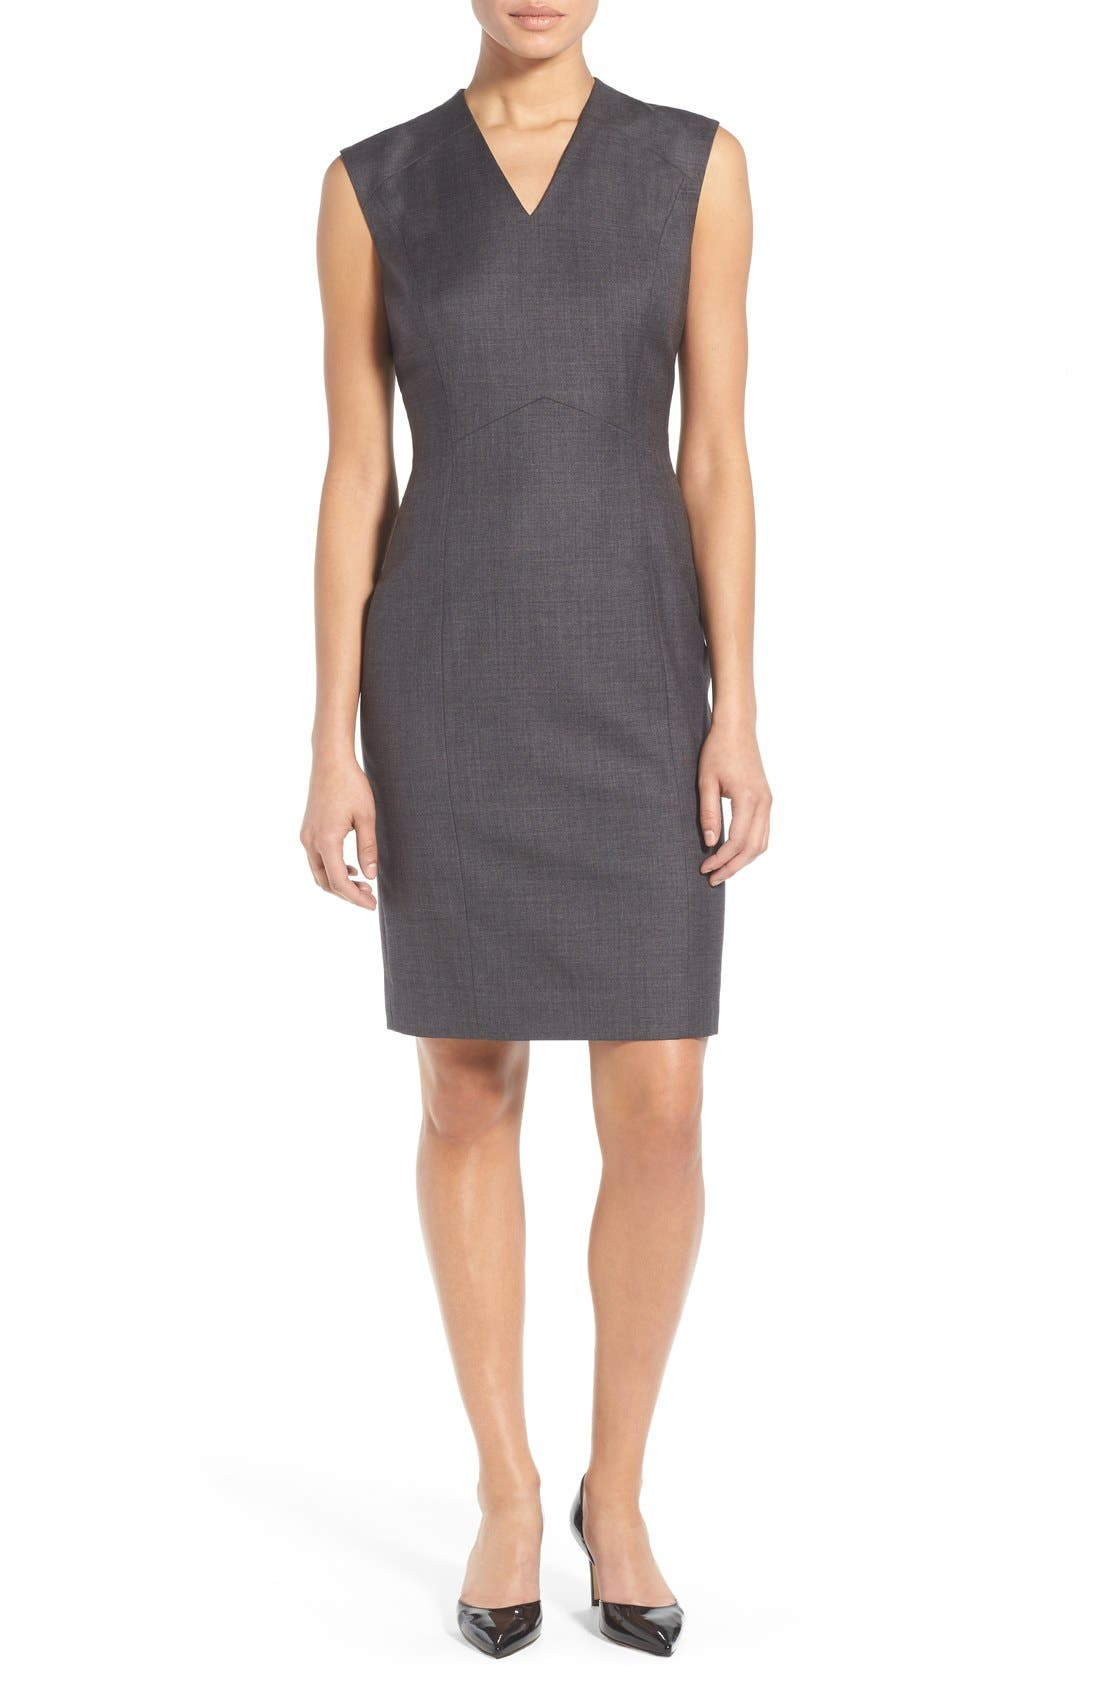 Alternate Image 1 Selected - Classiques Entier® V-Neck Superfine Wool Sheath Dress